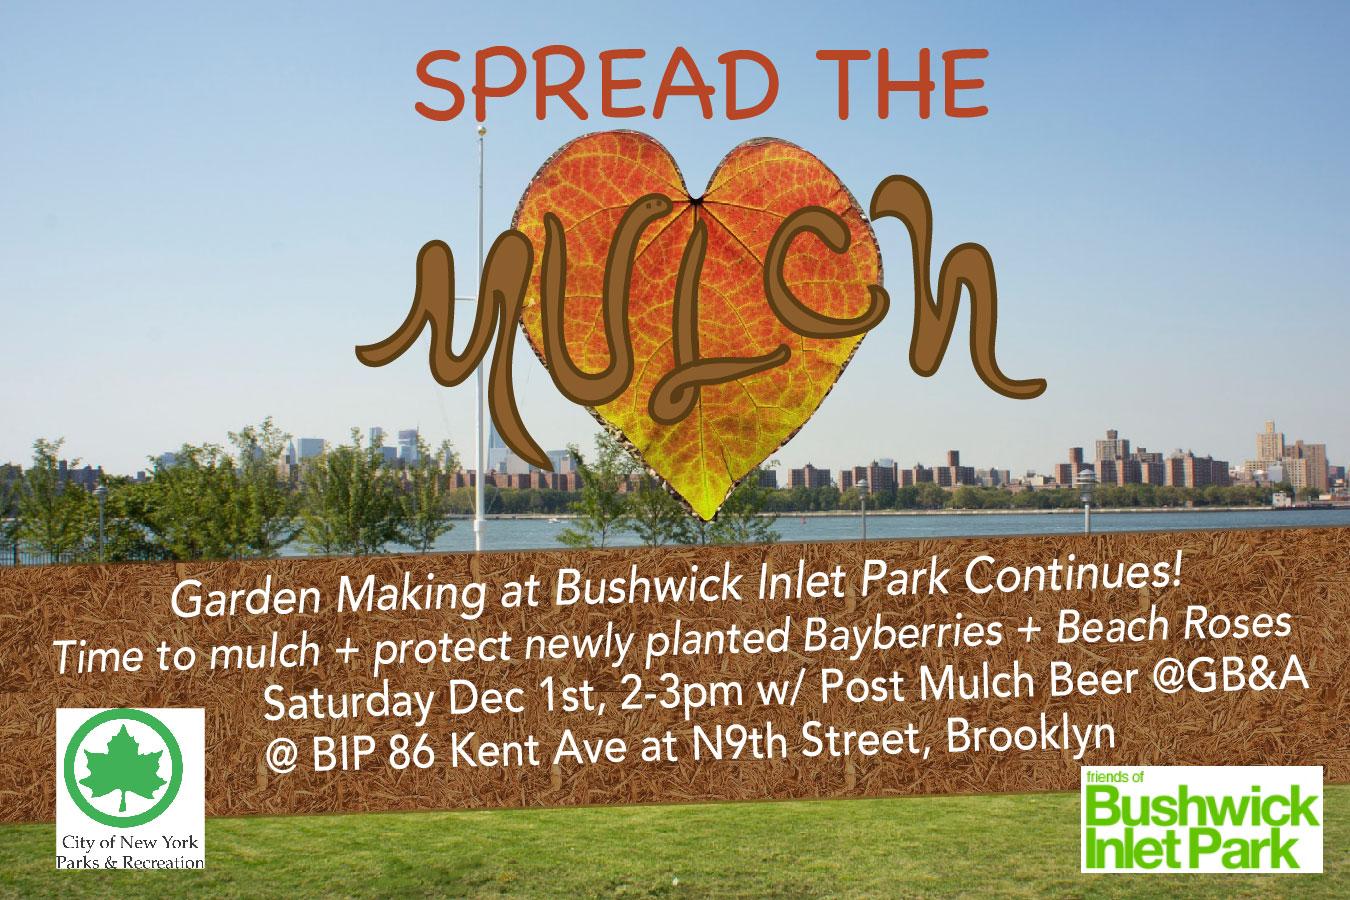 Spread the Mulch at BIP!